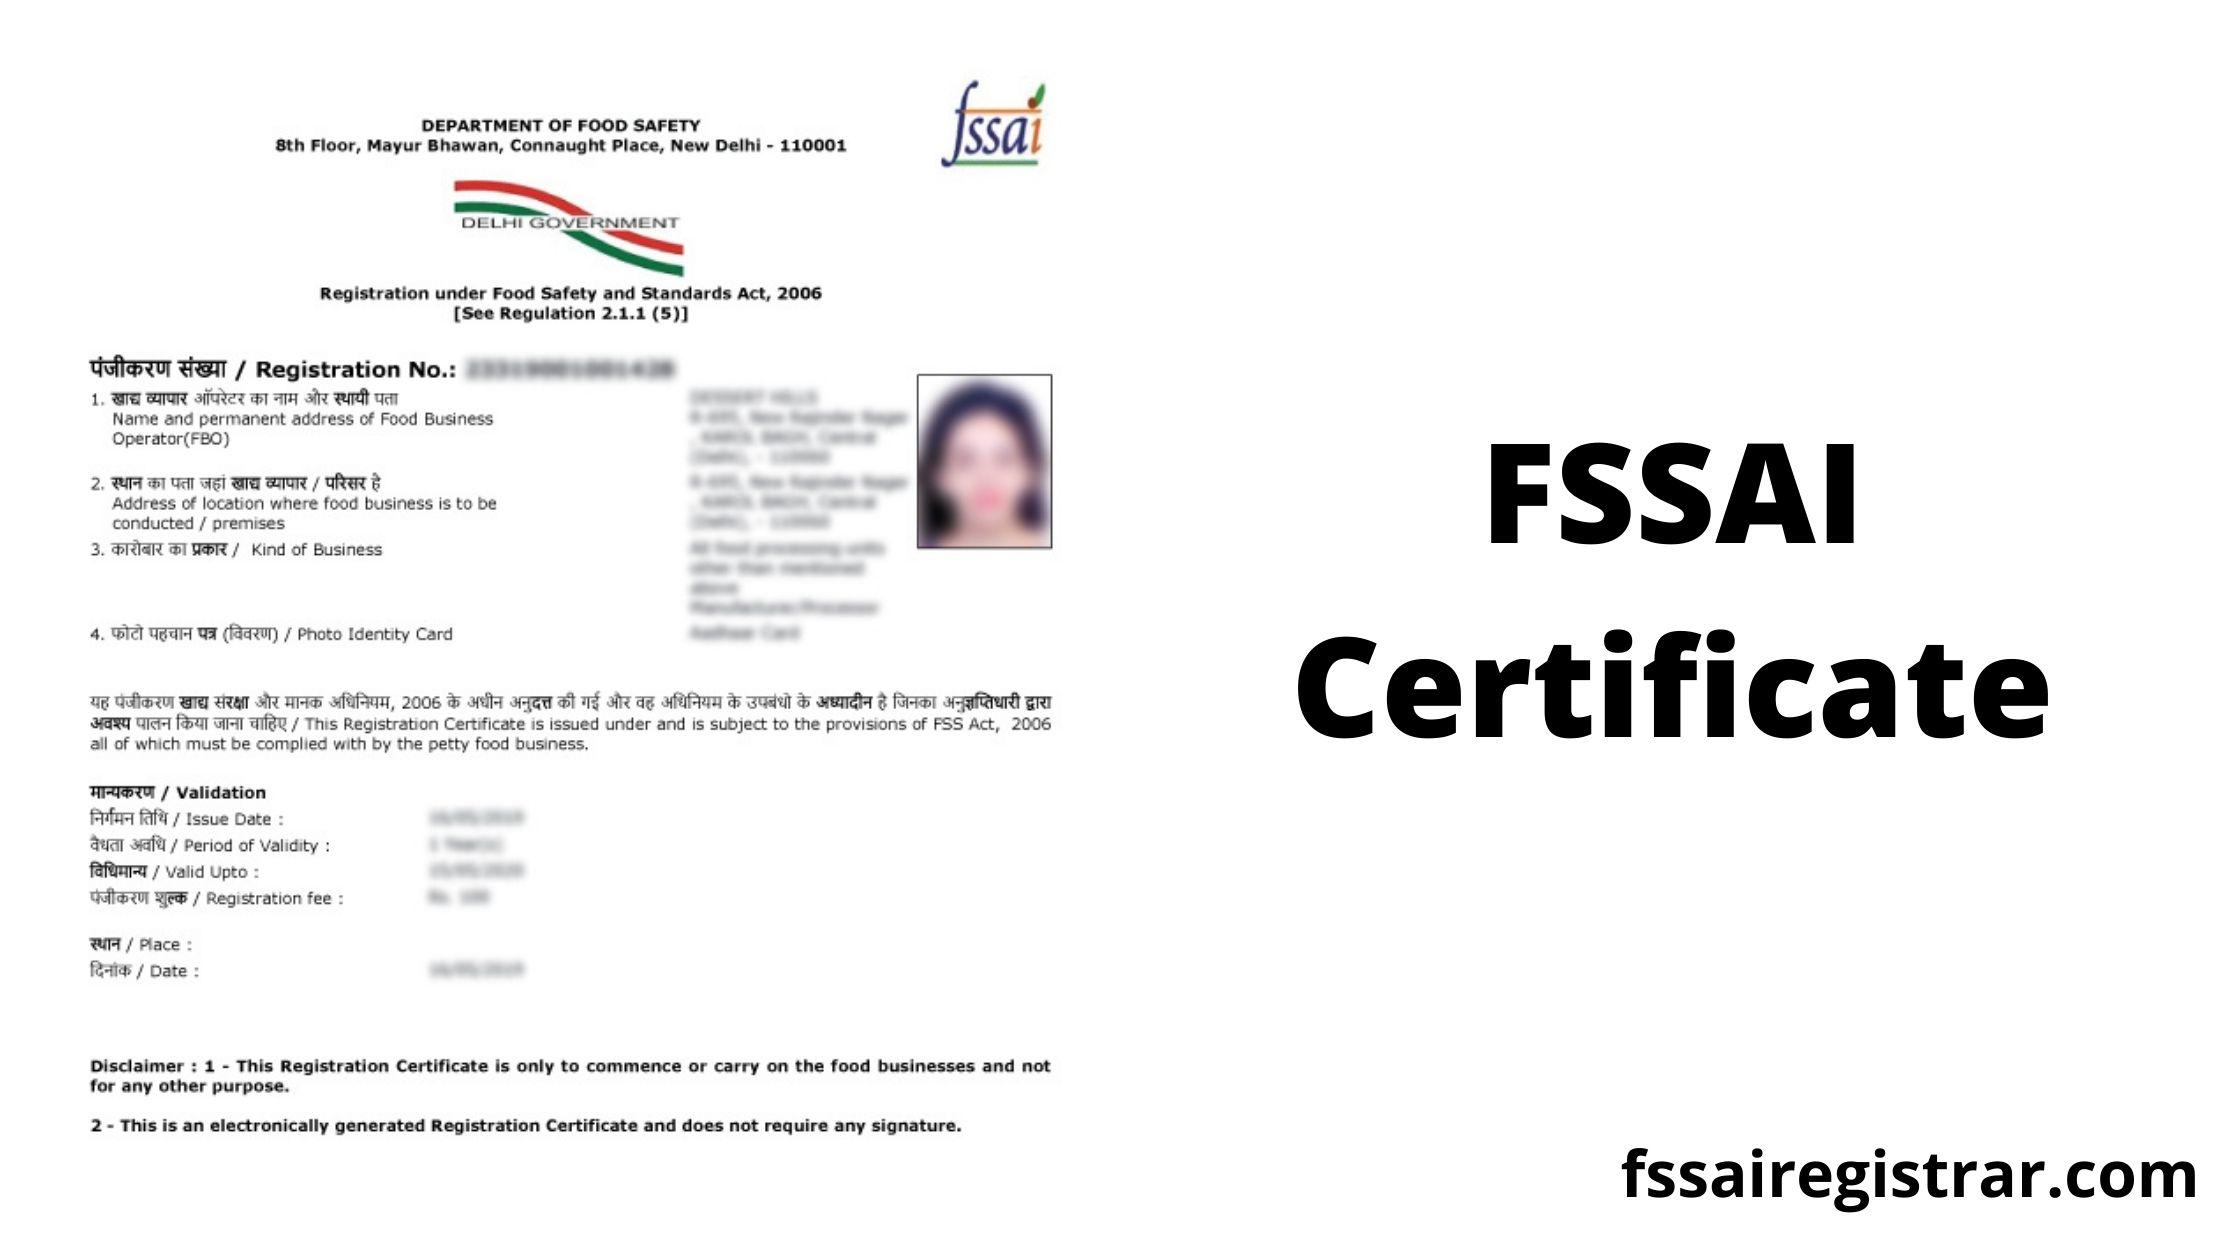 FSSAI Certificate - FSSAI Apply Online - FSSAI License Full Form